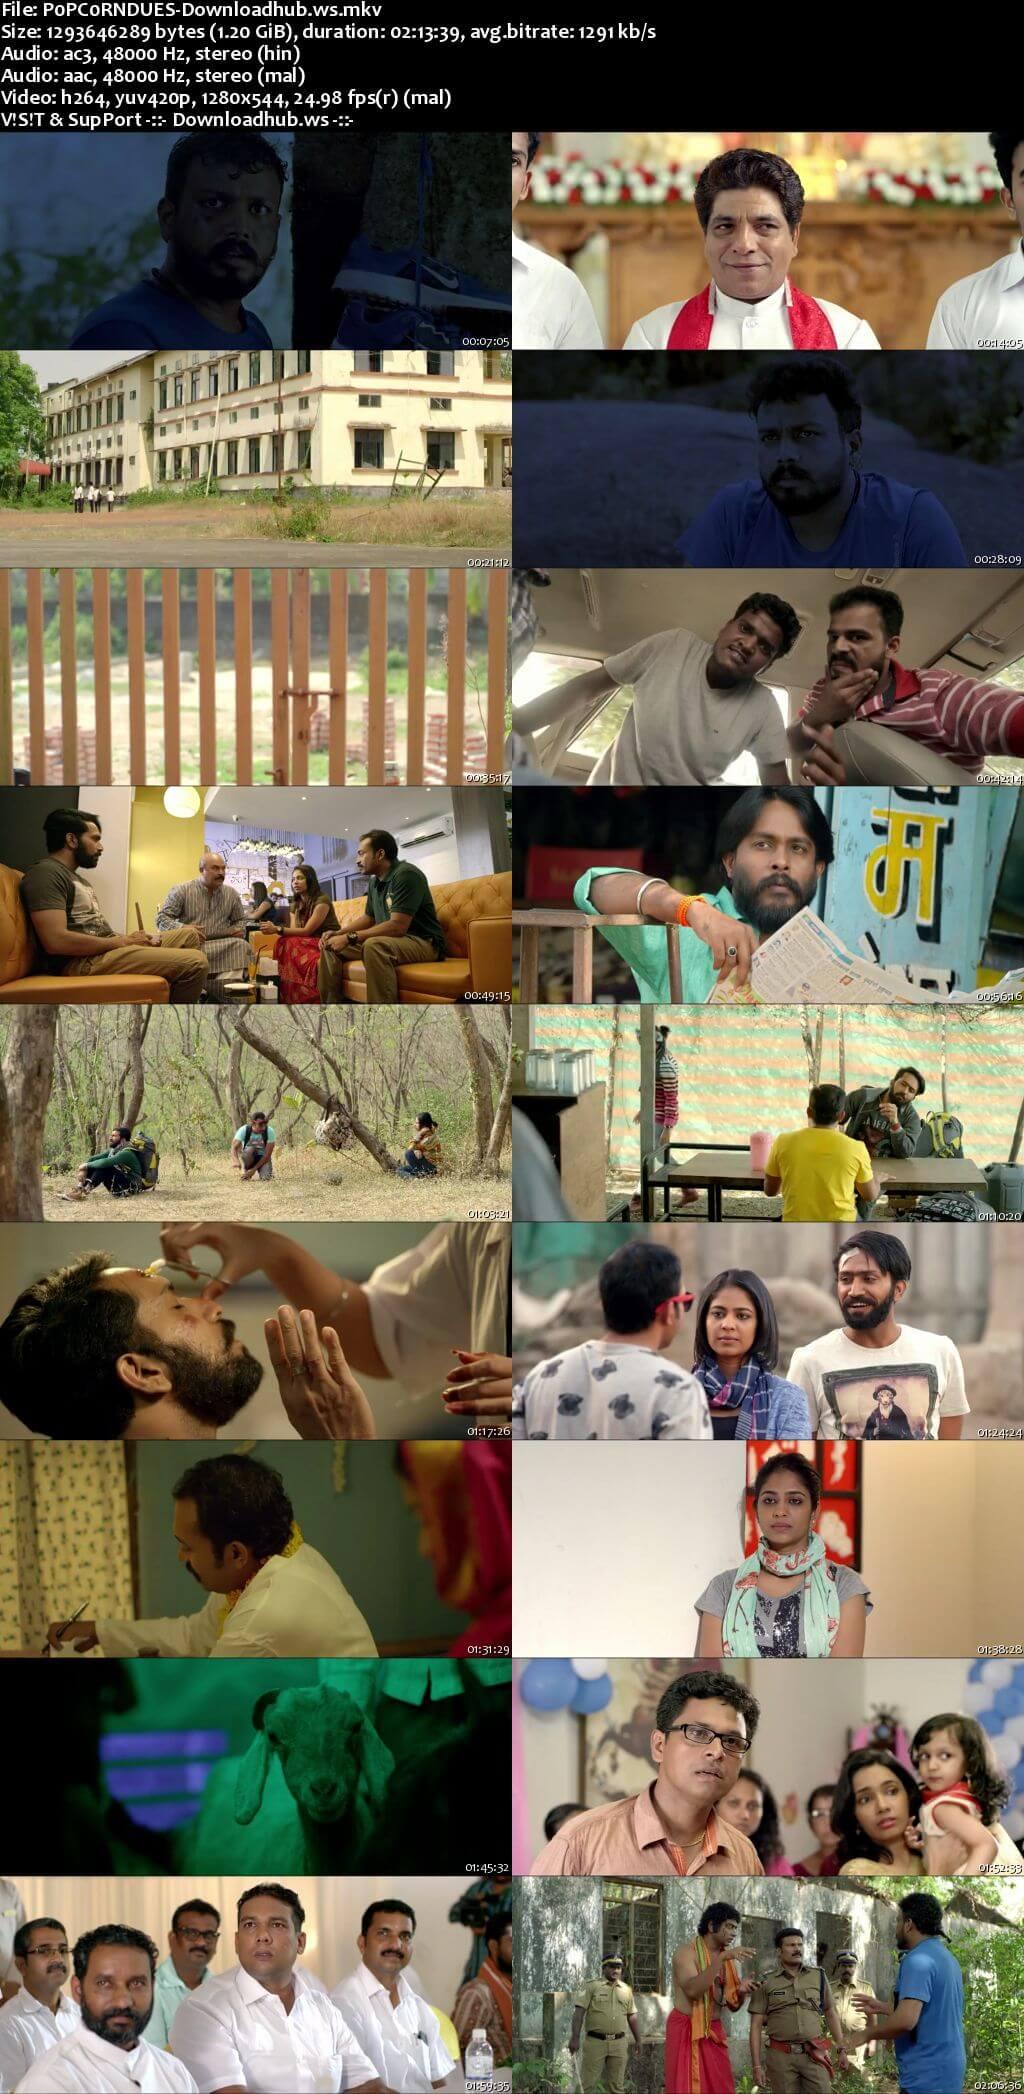 Popcorn 2016 UNCUT Hindi Dual Audio 720p HDRip Free Download